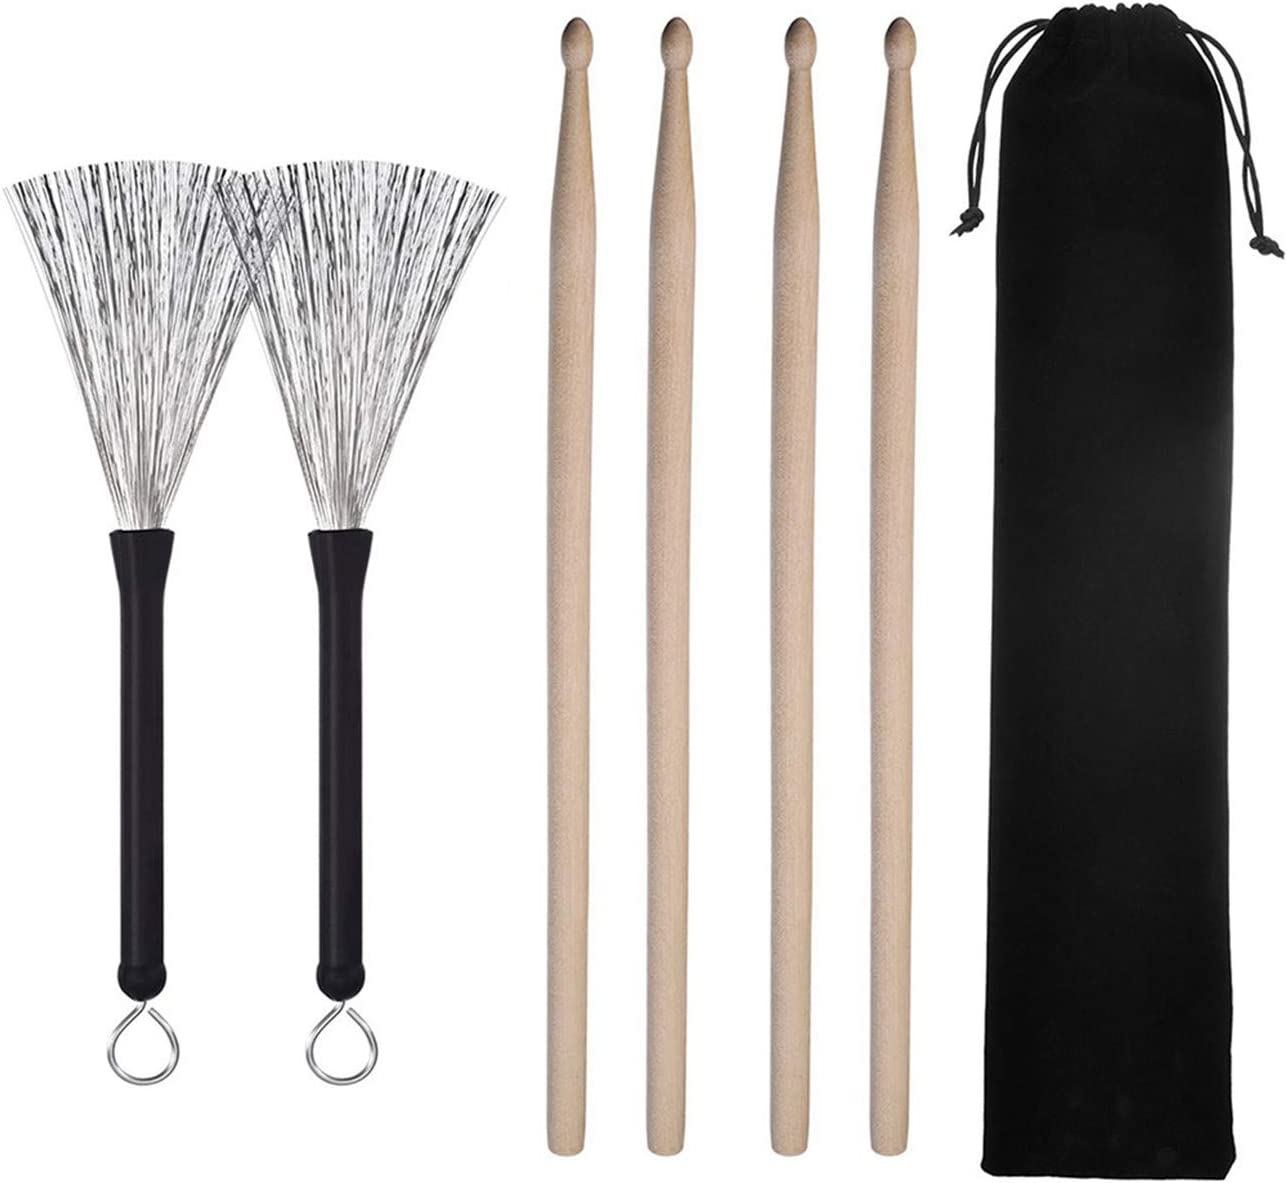 ZALING Classic Maple Wood Drumsticks Sets Drum Wire Brushes Retractable Drum Sticks Brush